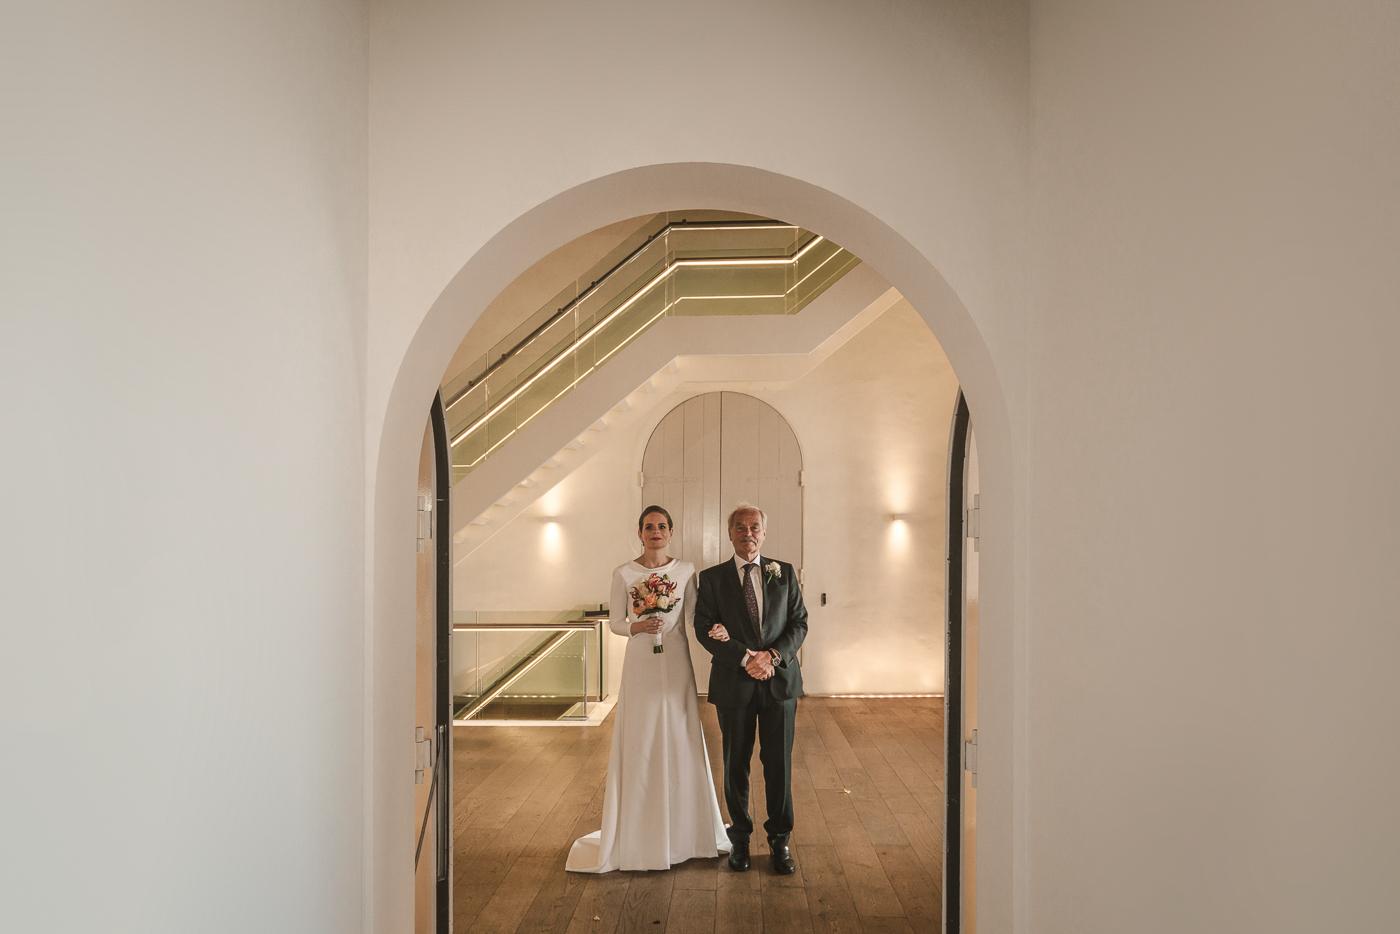 bruidsfotografie-trouwfotograaf-wedding-photographer-amsterdam-James-Jantine-110.jpg